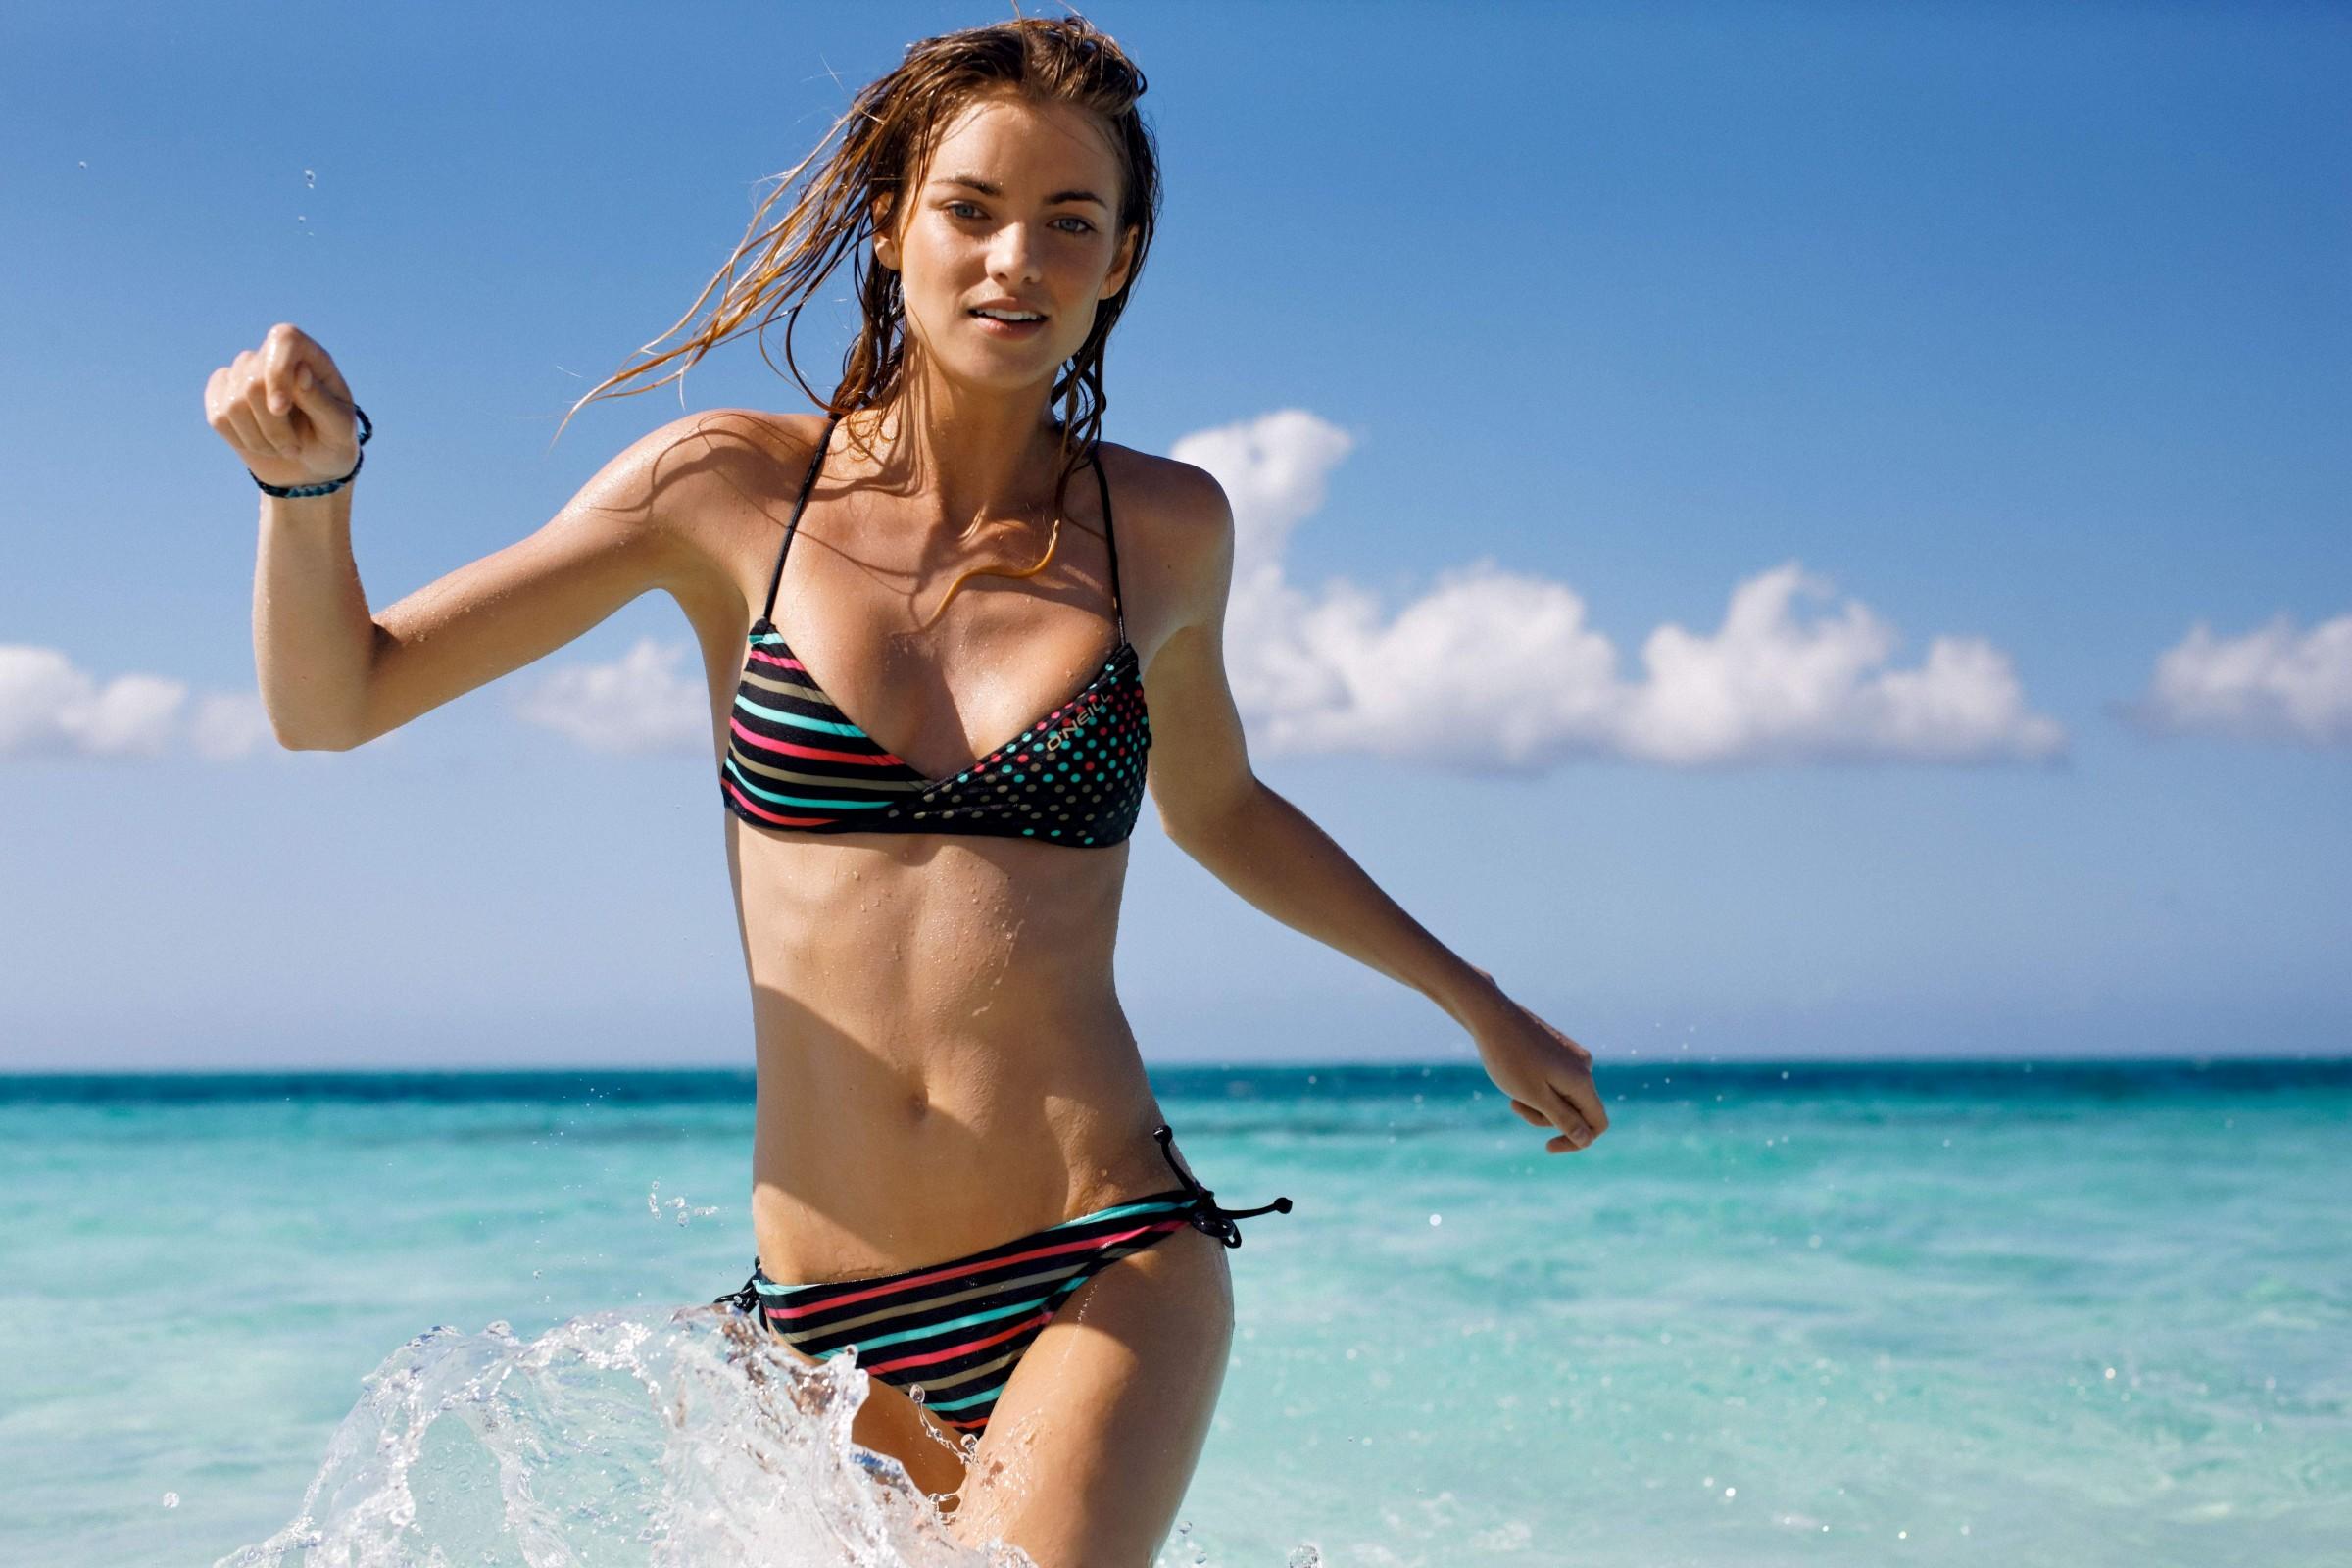 beach-bikini-modeling-video-gong-li-tits